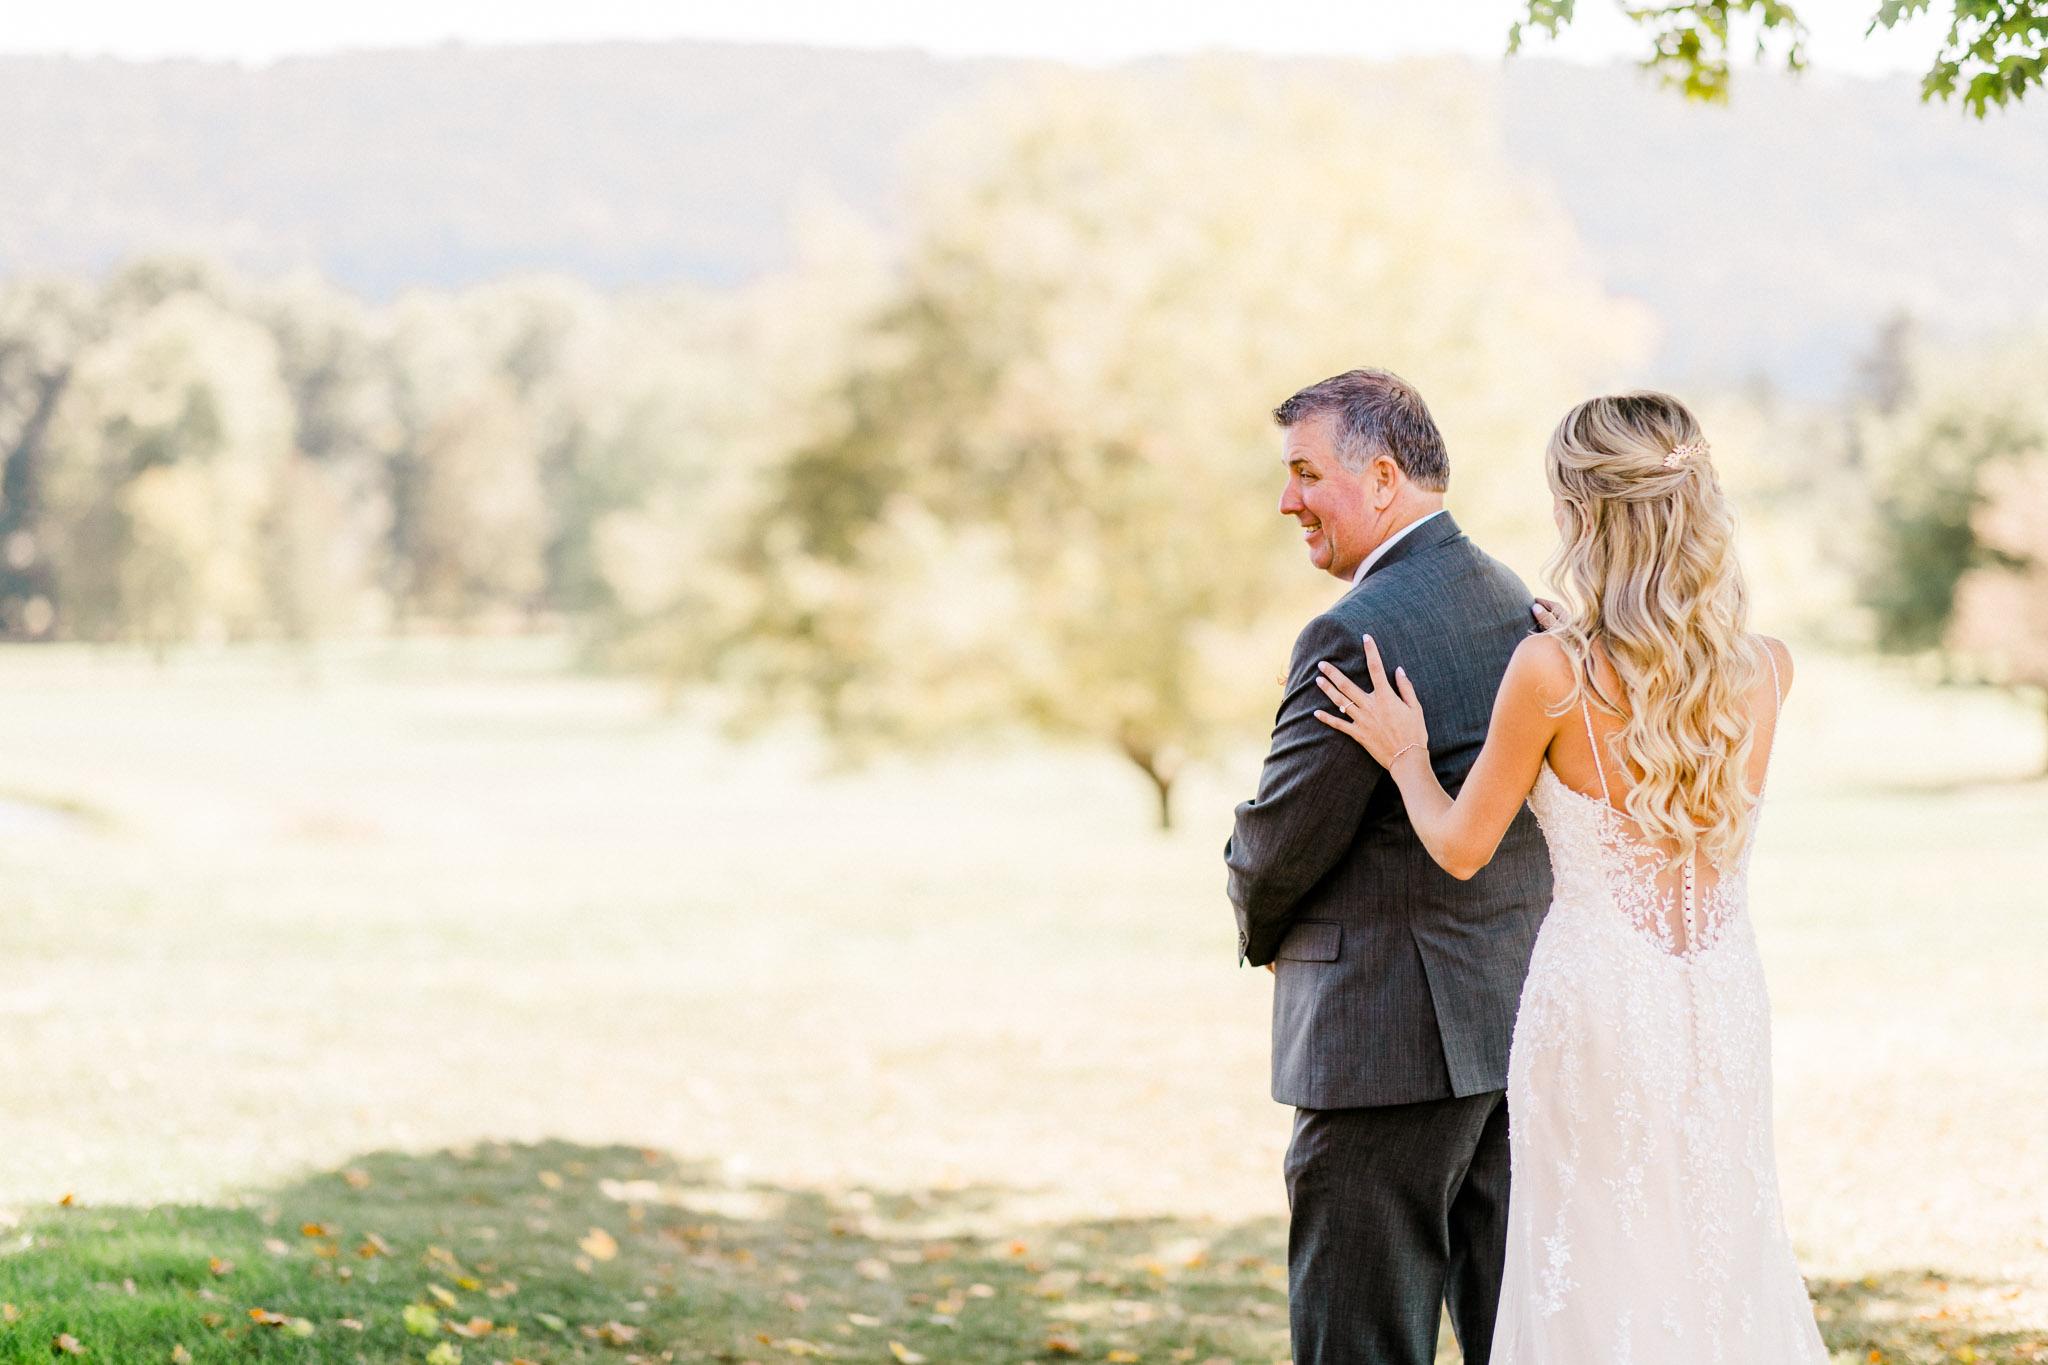 Frosty-Valley-September-Wedding-7116.jpg